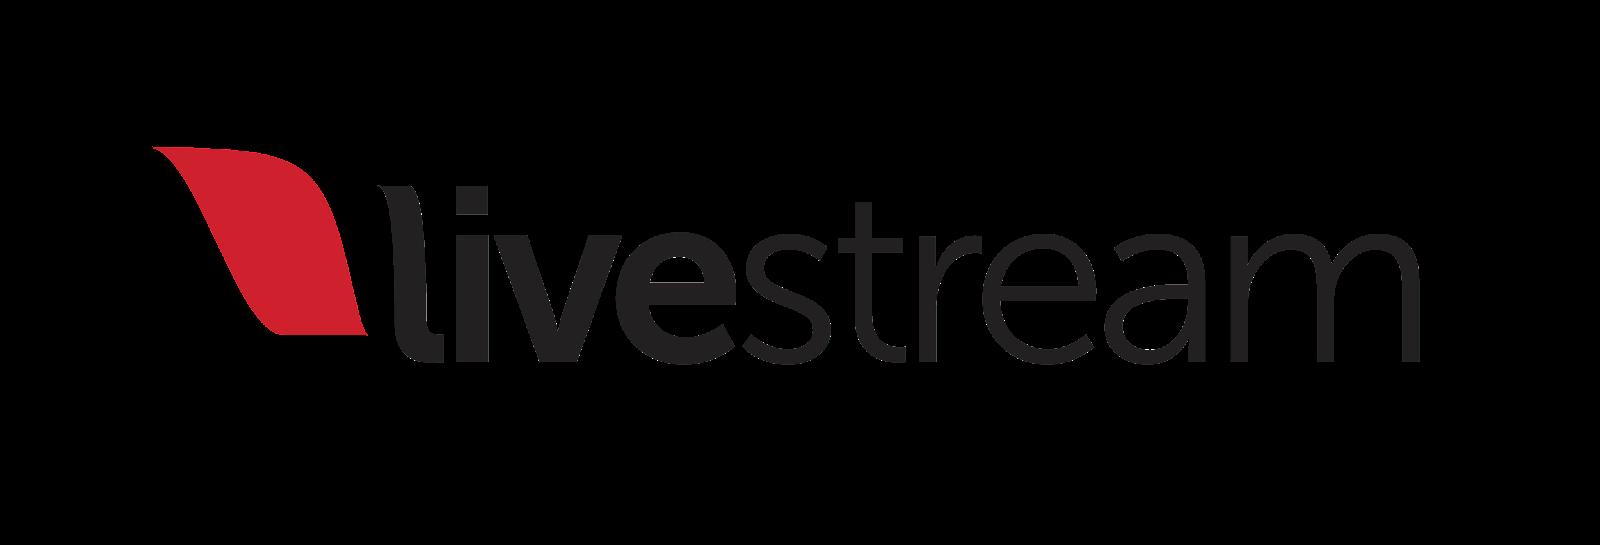 Livestream logo webinar tool